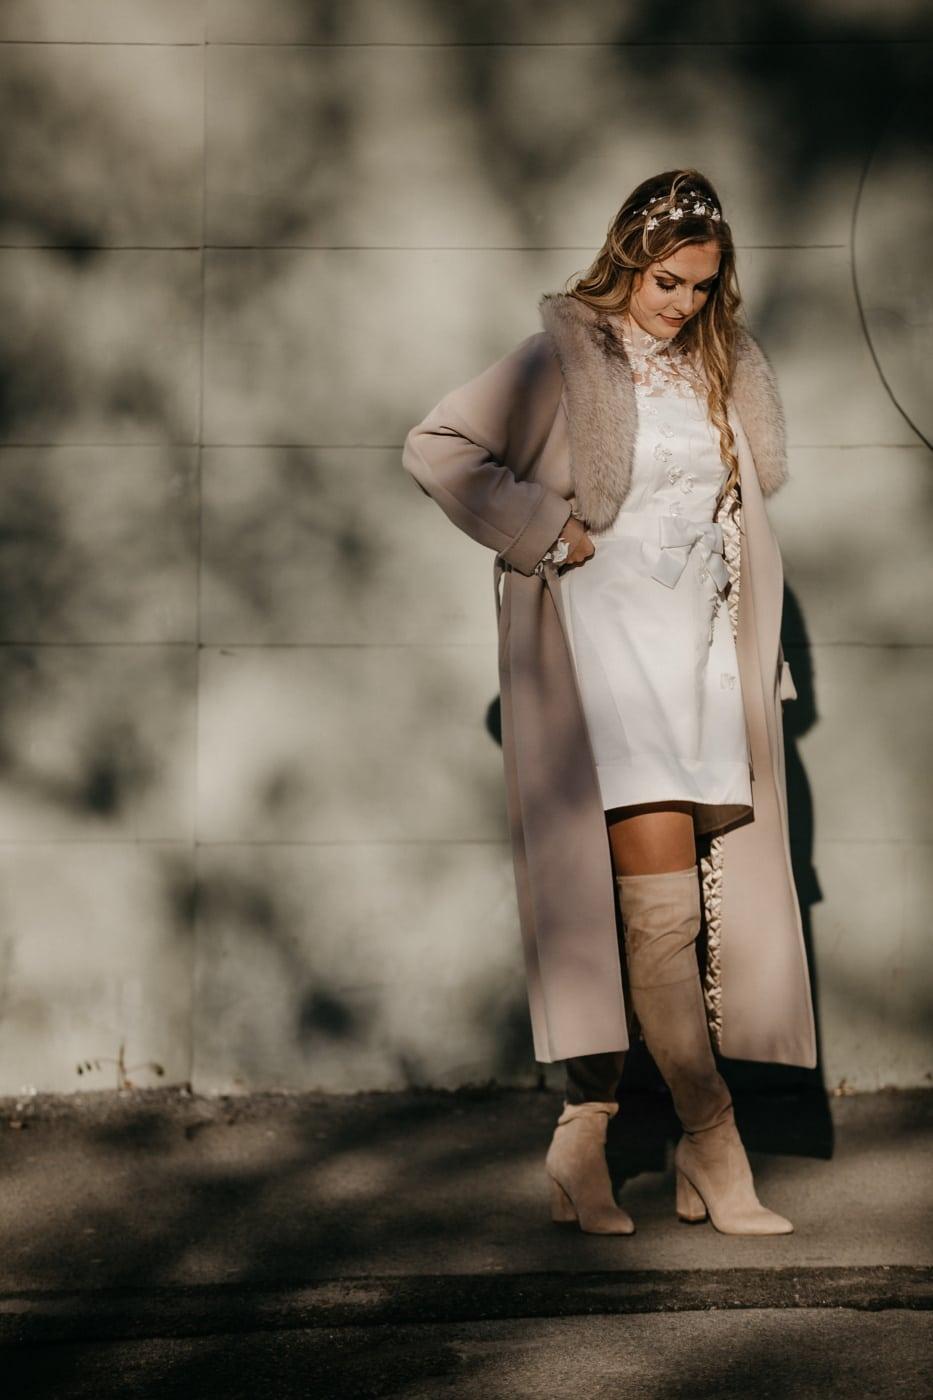 wait, alone, gorgeous, pretty girl, coat, glamour, fashion, model, girl, skirt